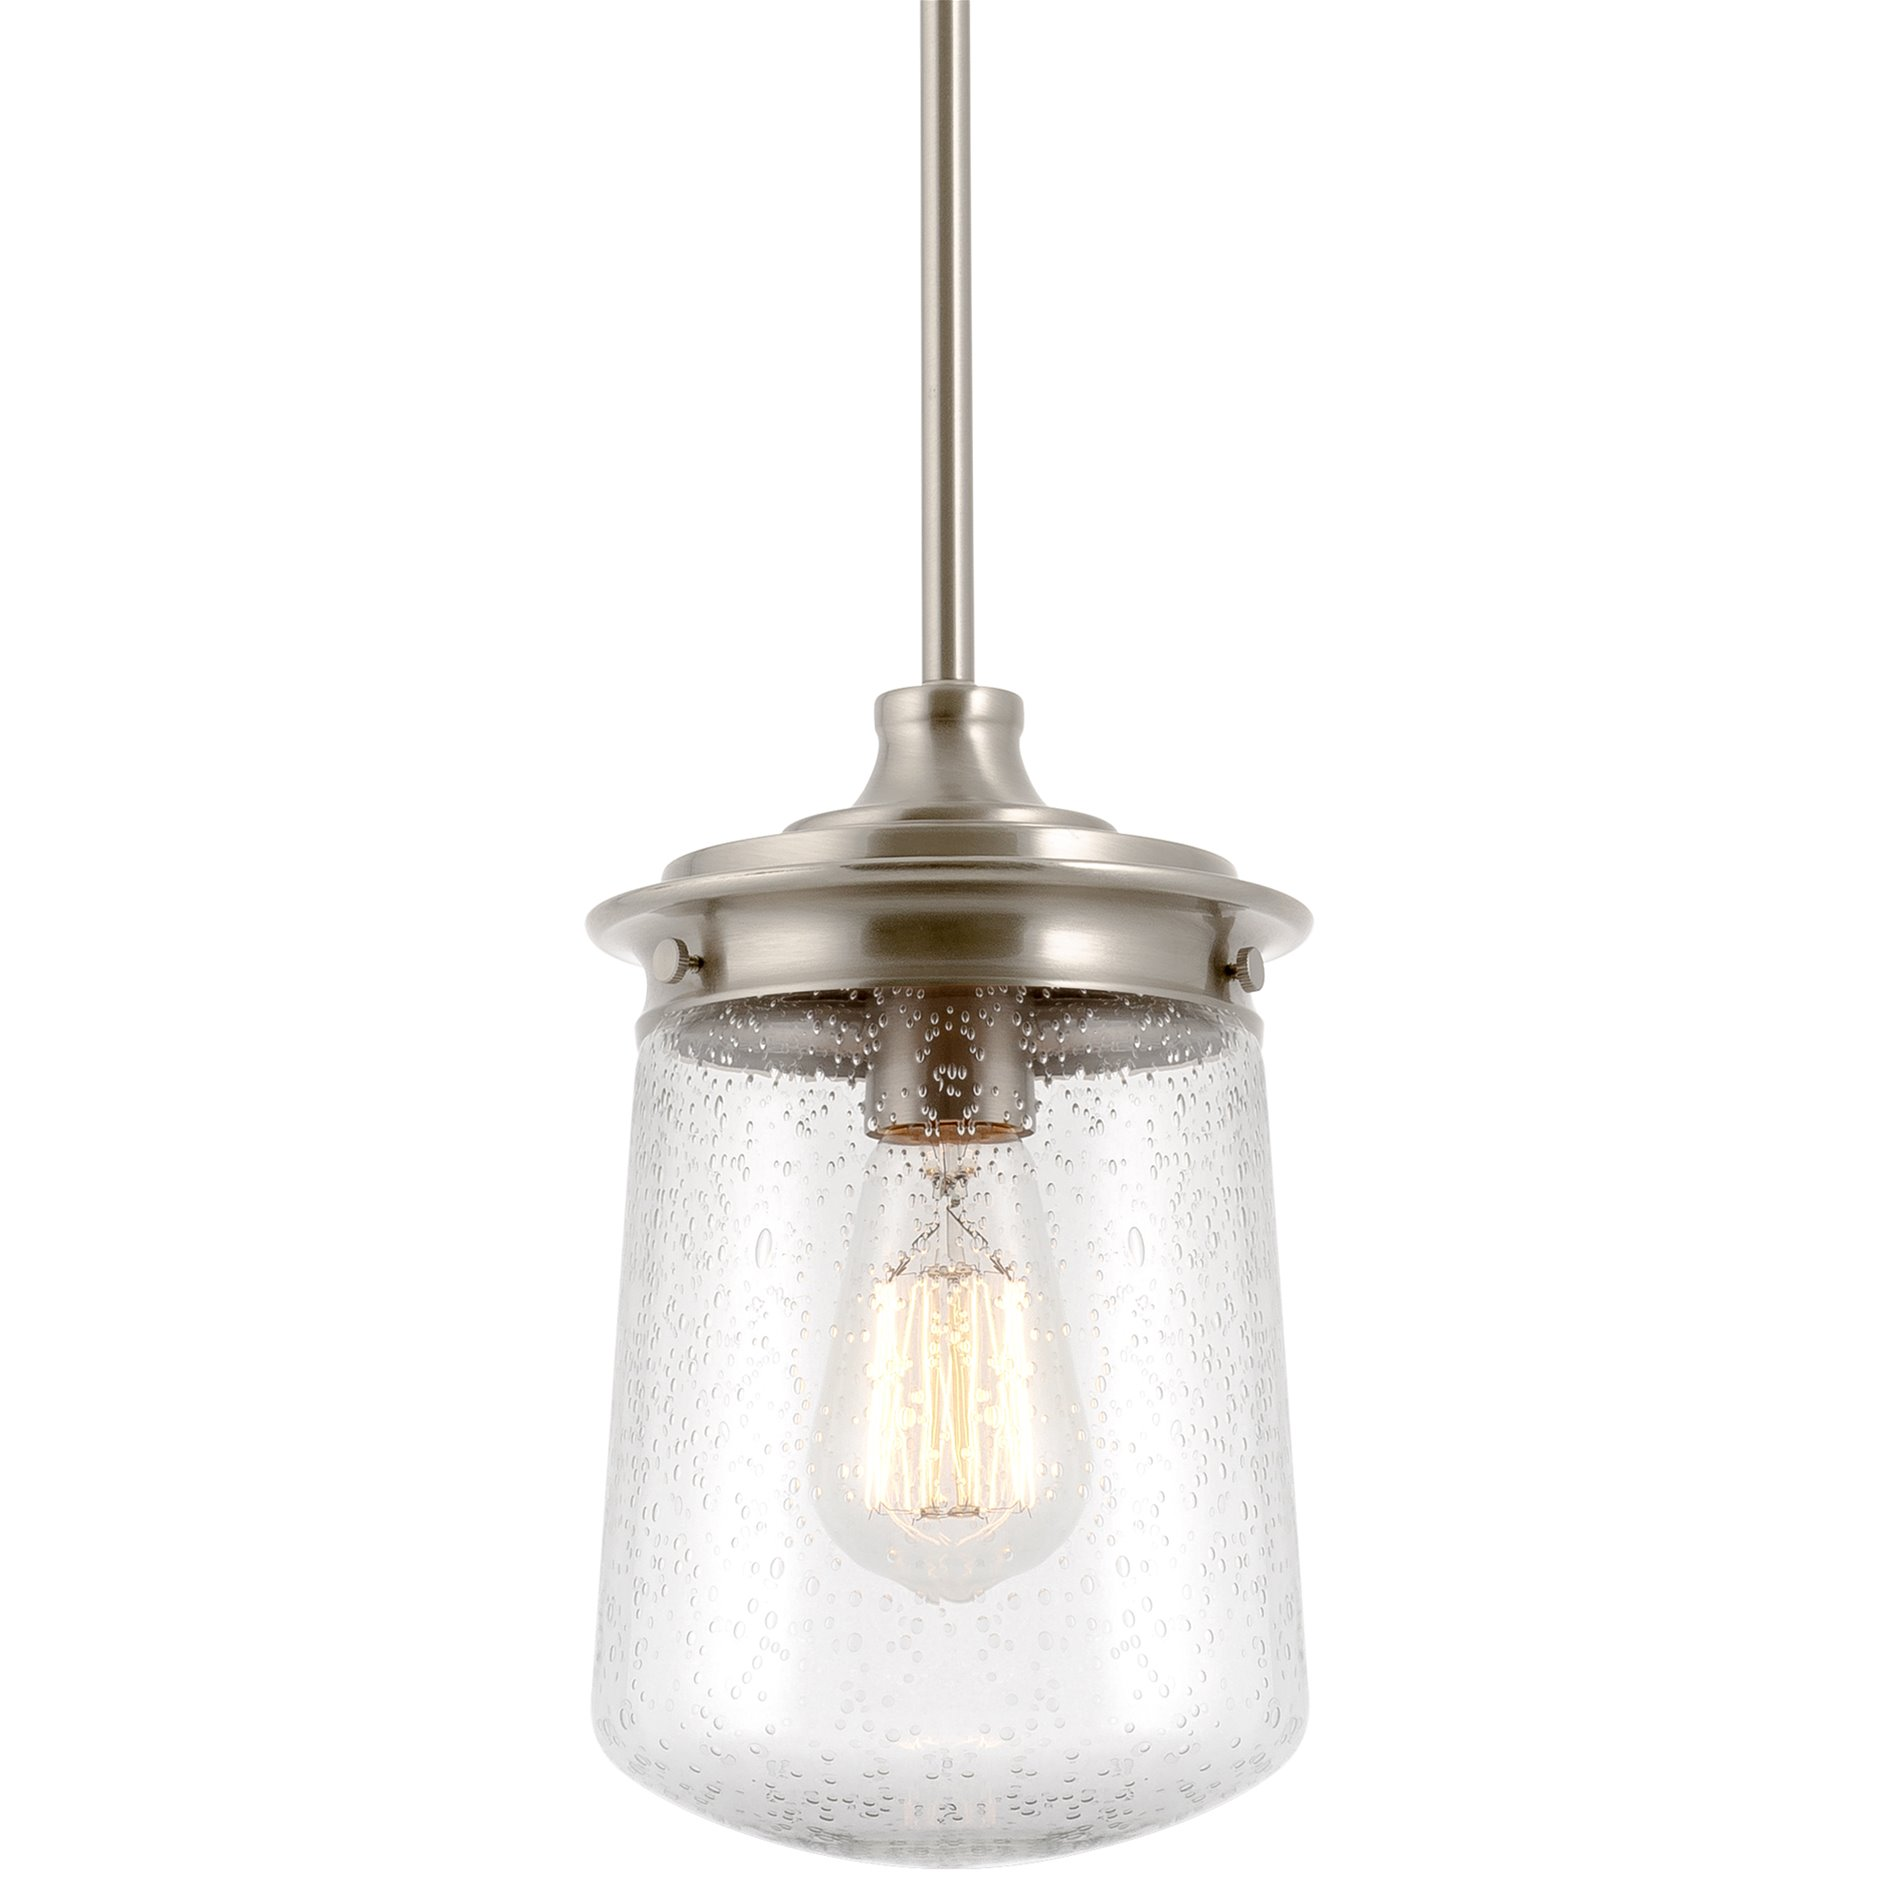 Picture of: Kira Home Mason 10 5 Industrial Pendant Light Seeded Glass Shade Brushed Nickel Finish Walmart Com Walmart Com